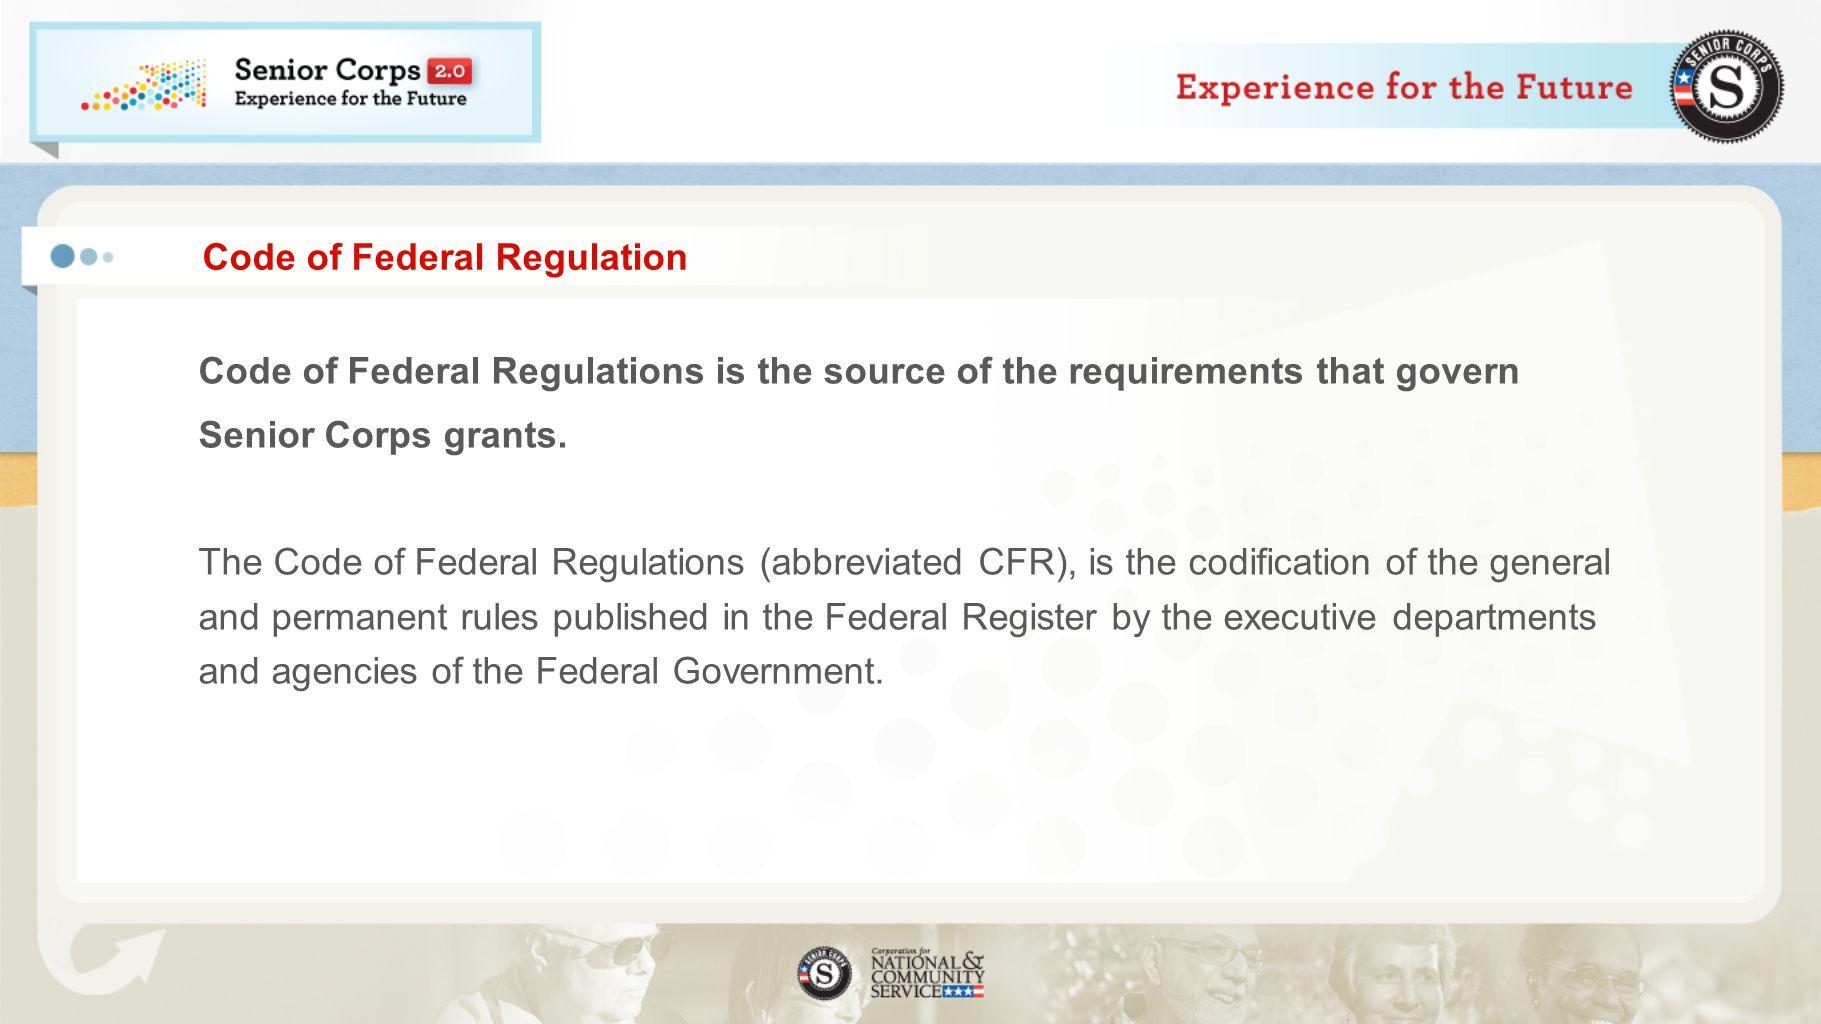 Code of Federal Regulation